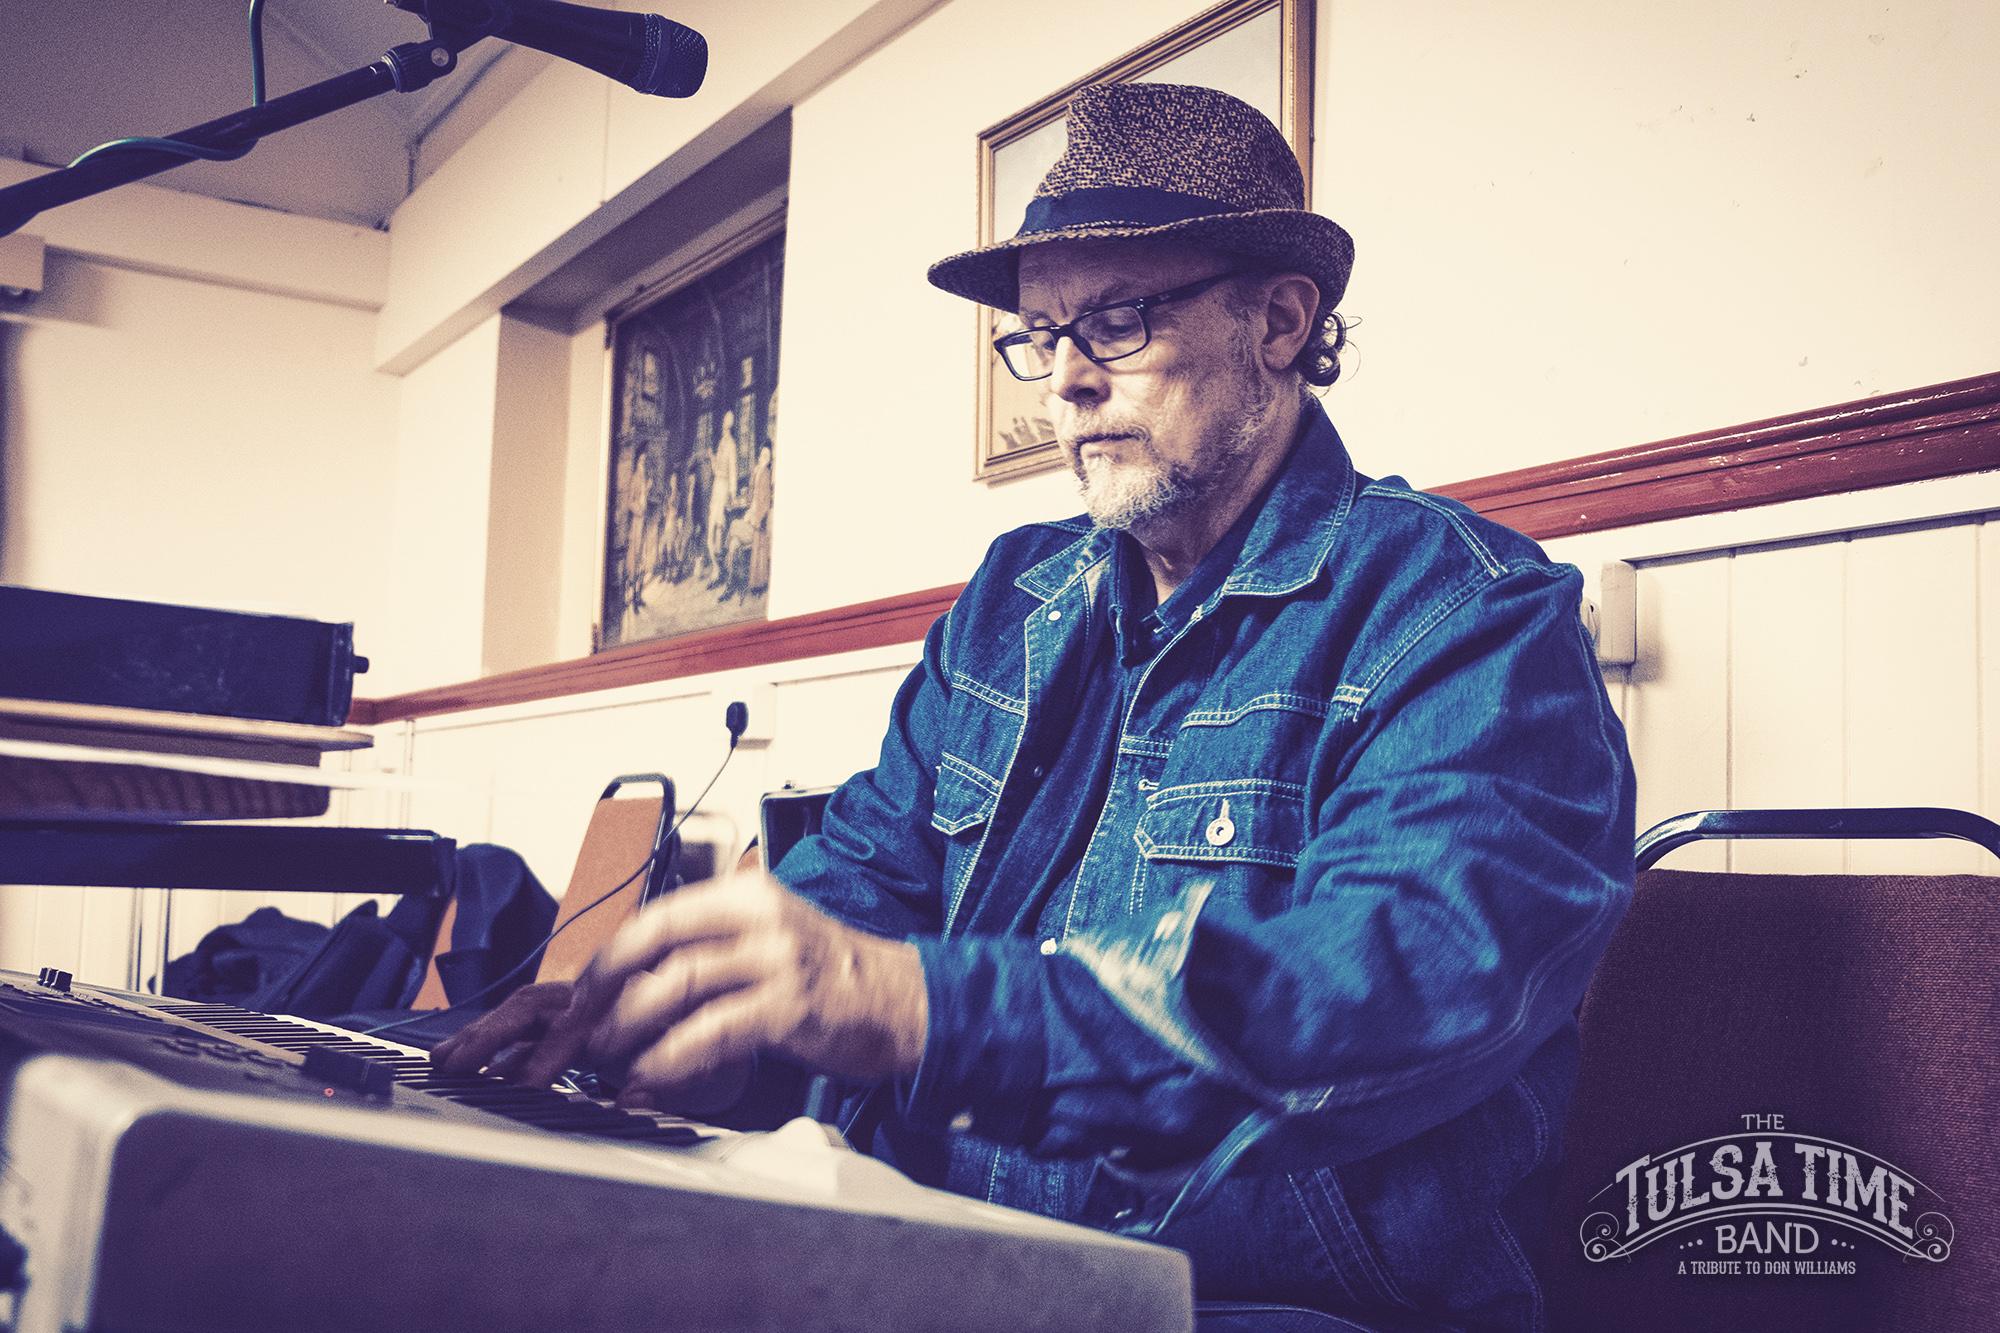 TulsaTimeBand Promo WEB Pix 0119-WestMoors-Rehersal-23.jpg